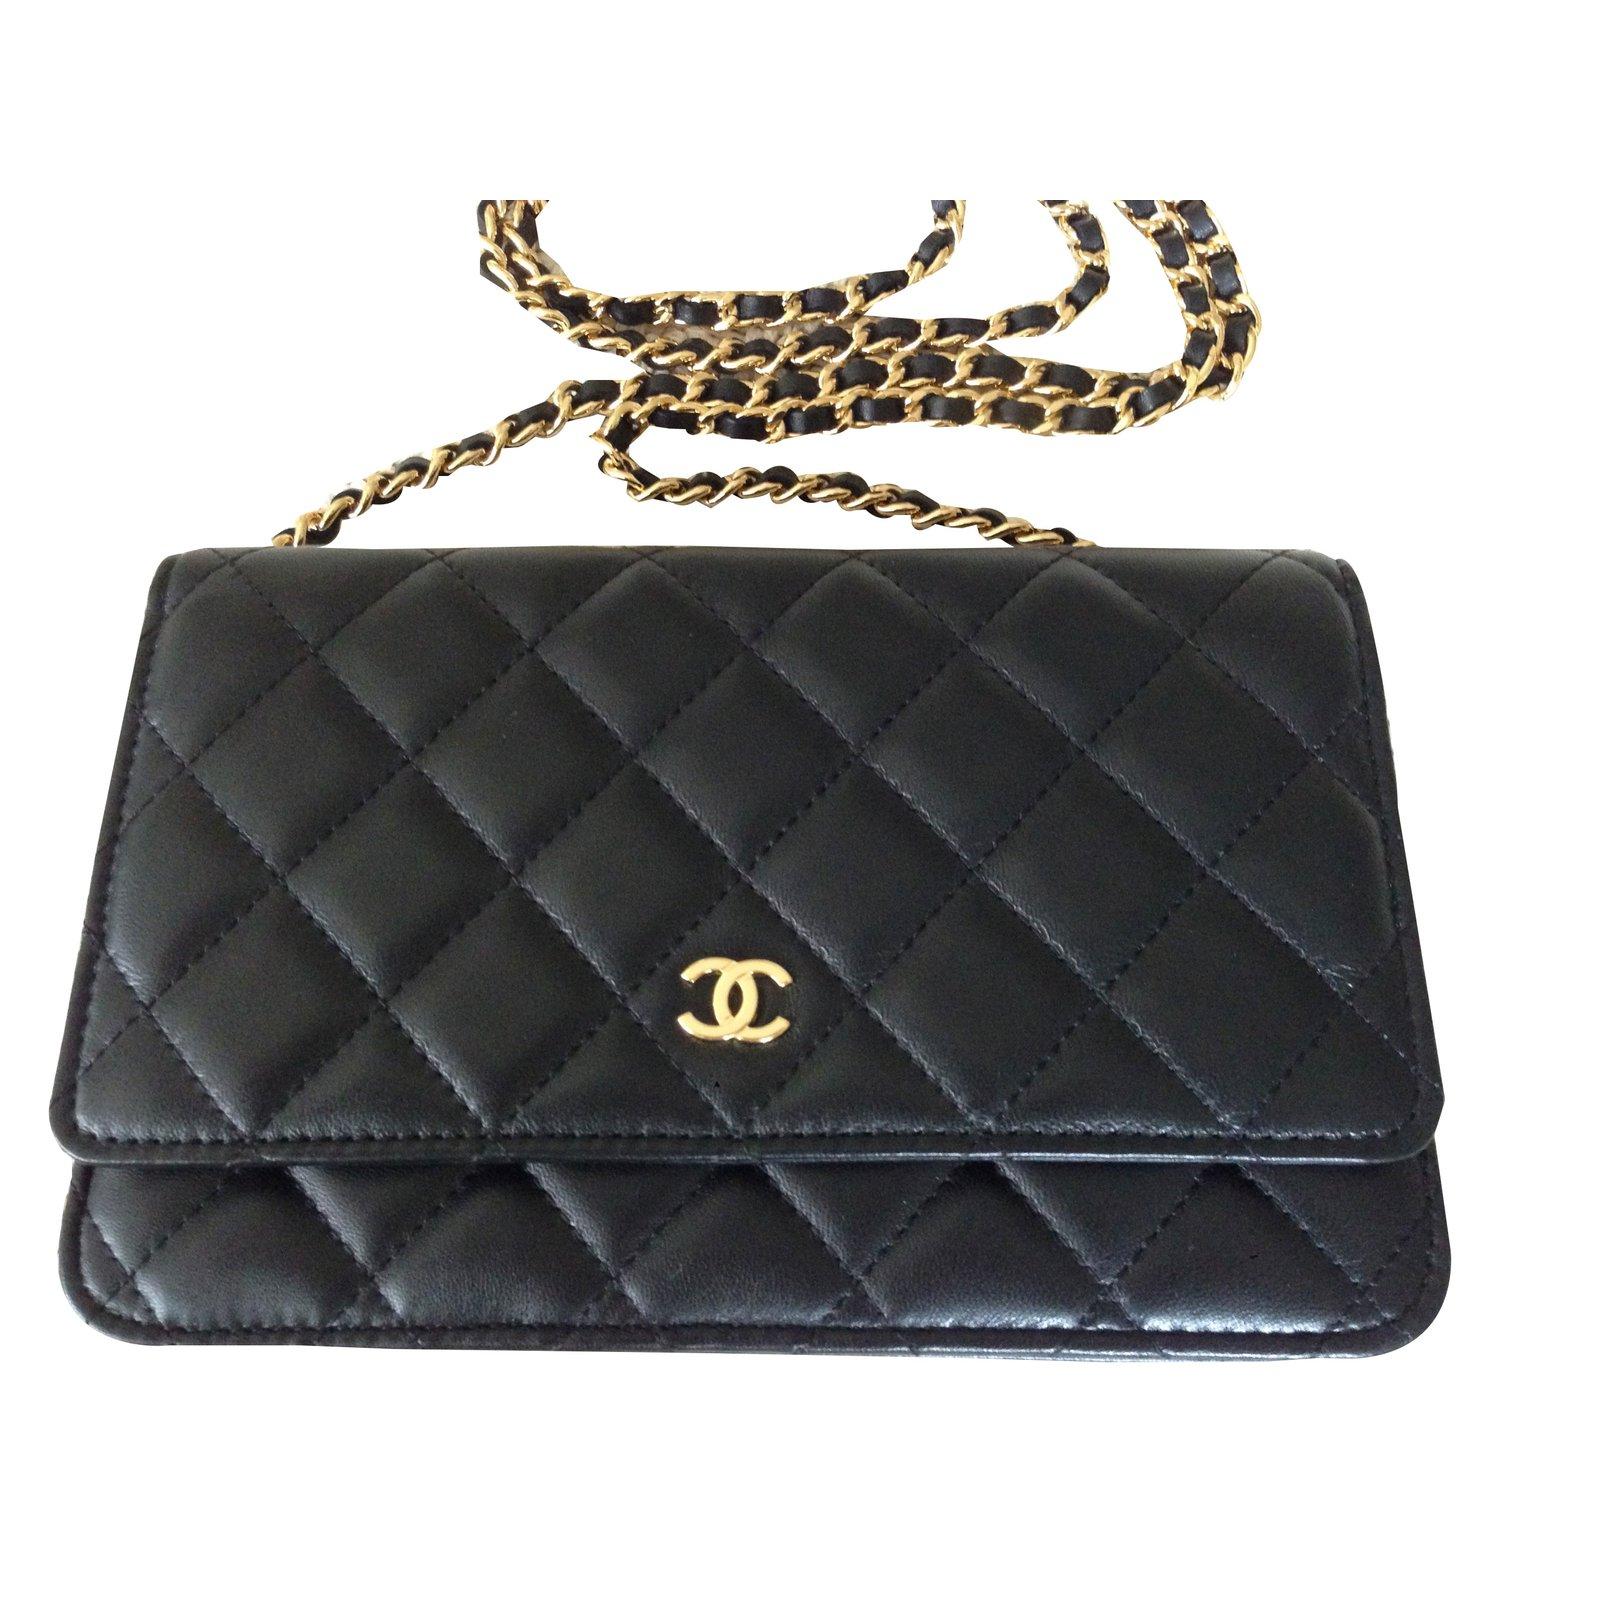 2db976c2f63c Chanel Wallet On Chain Handbags Leather Black ref.43455 - Joli Closet